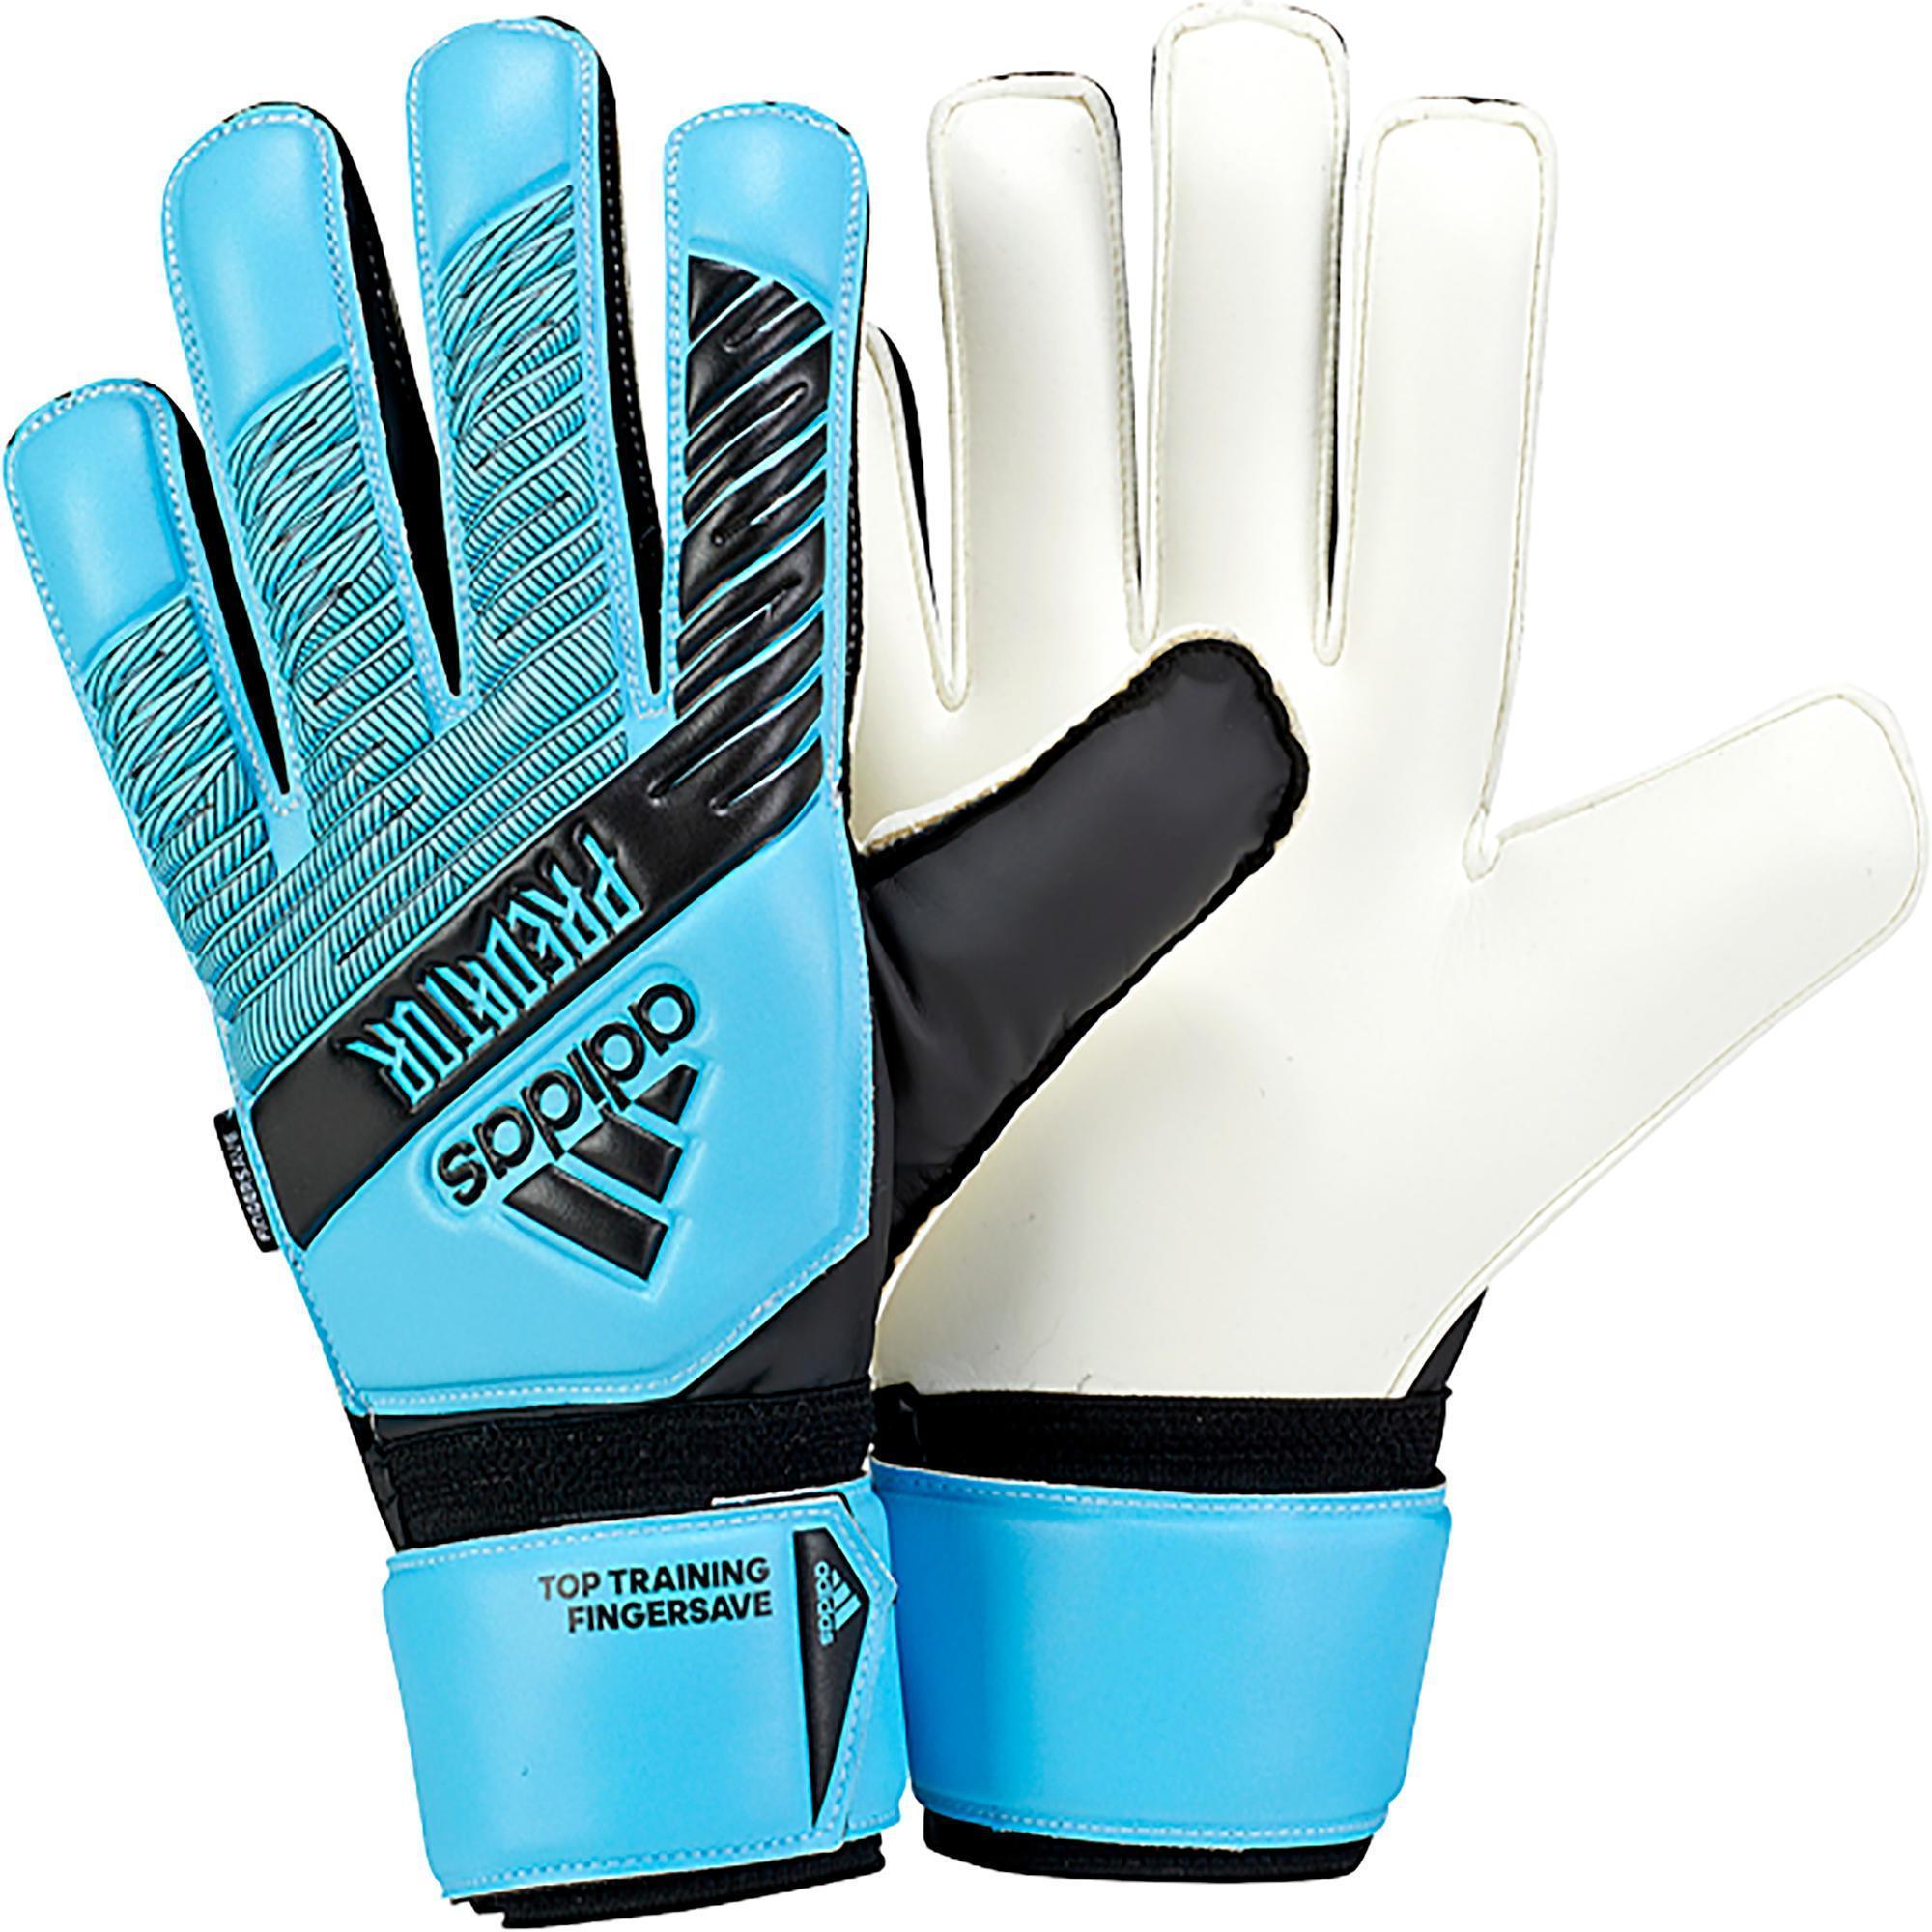 Adult Goalkeeper Glove Adidas Predator